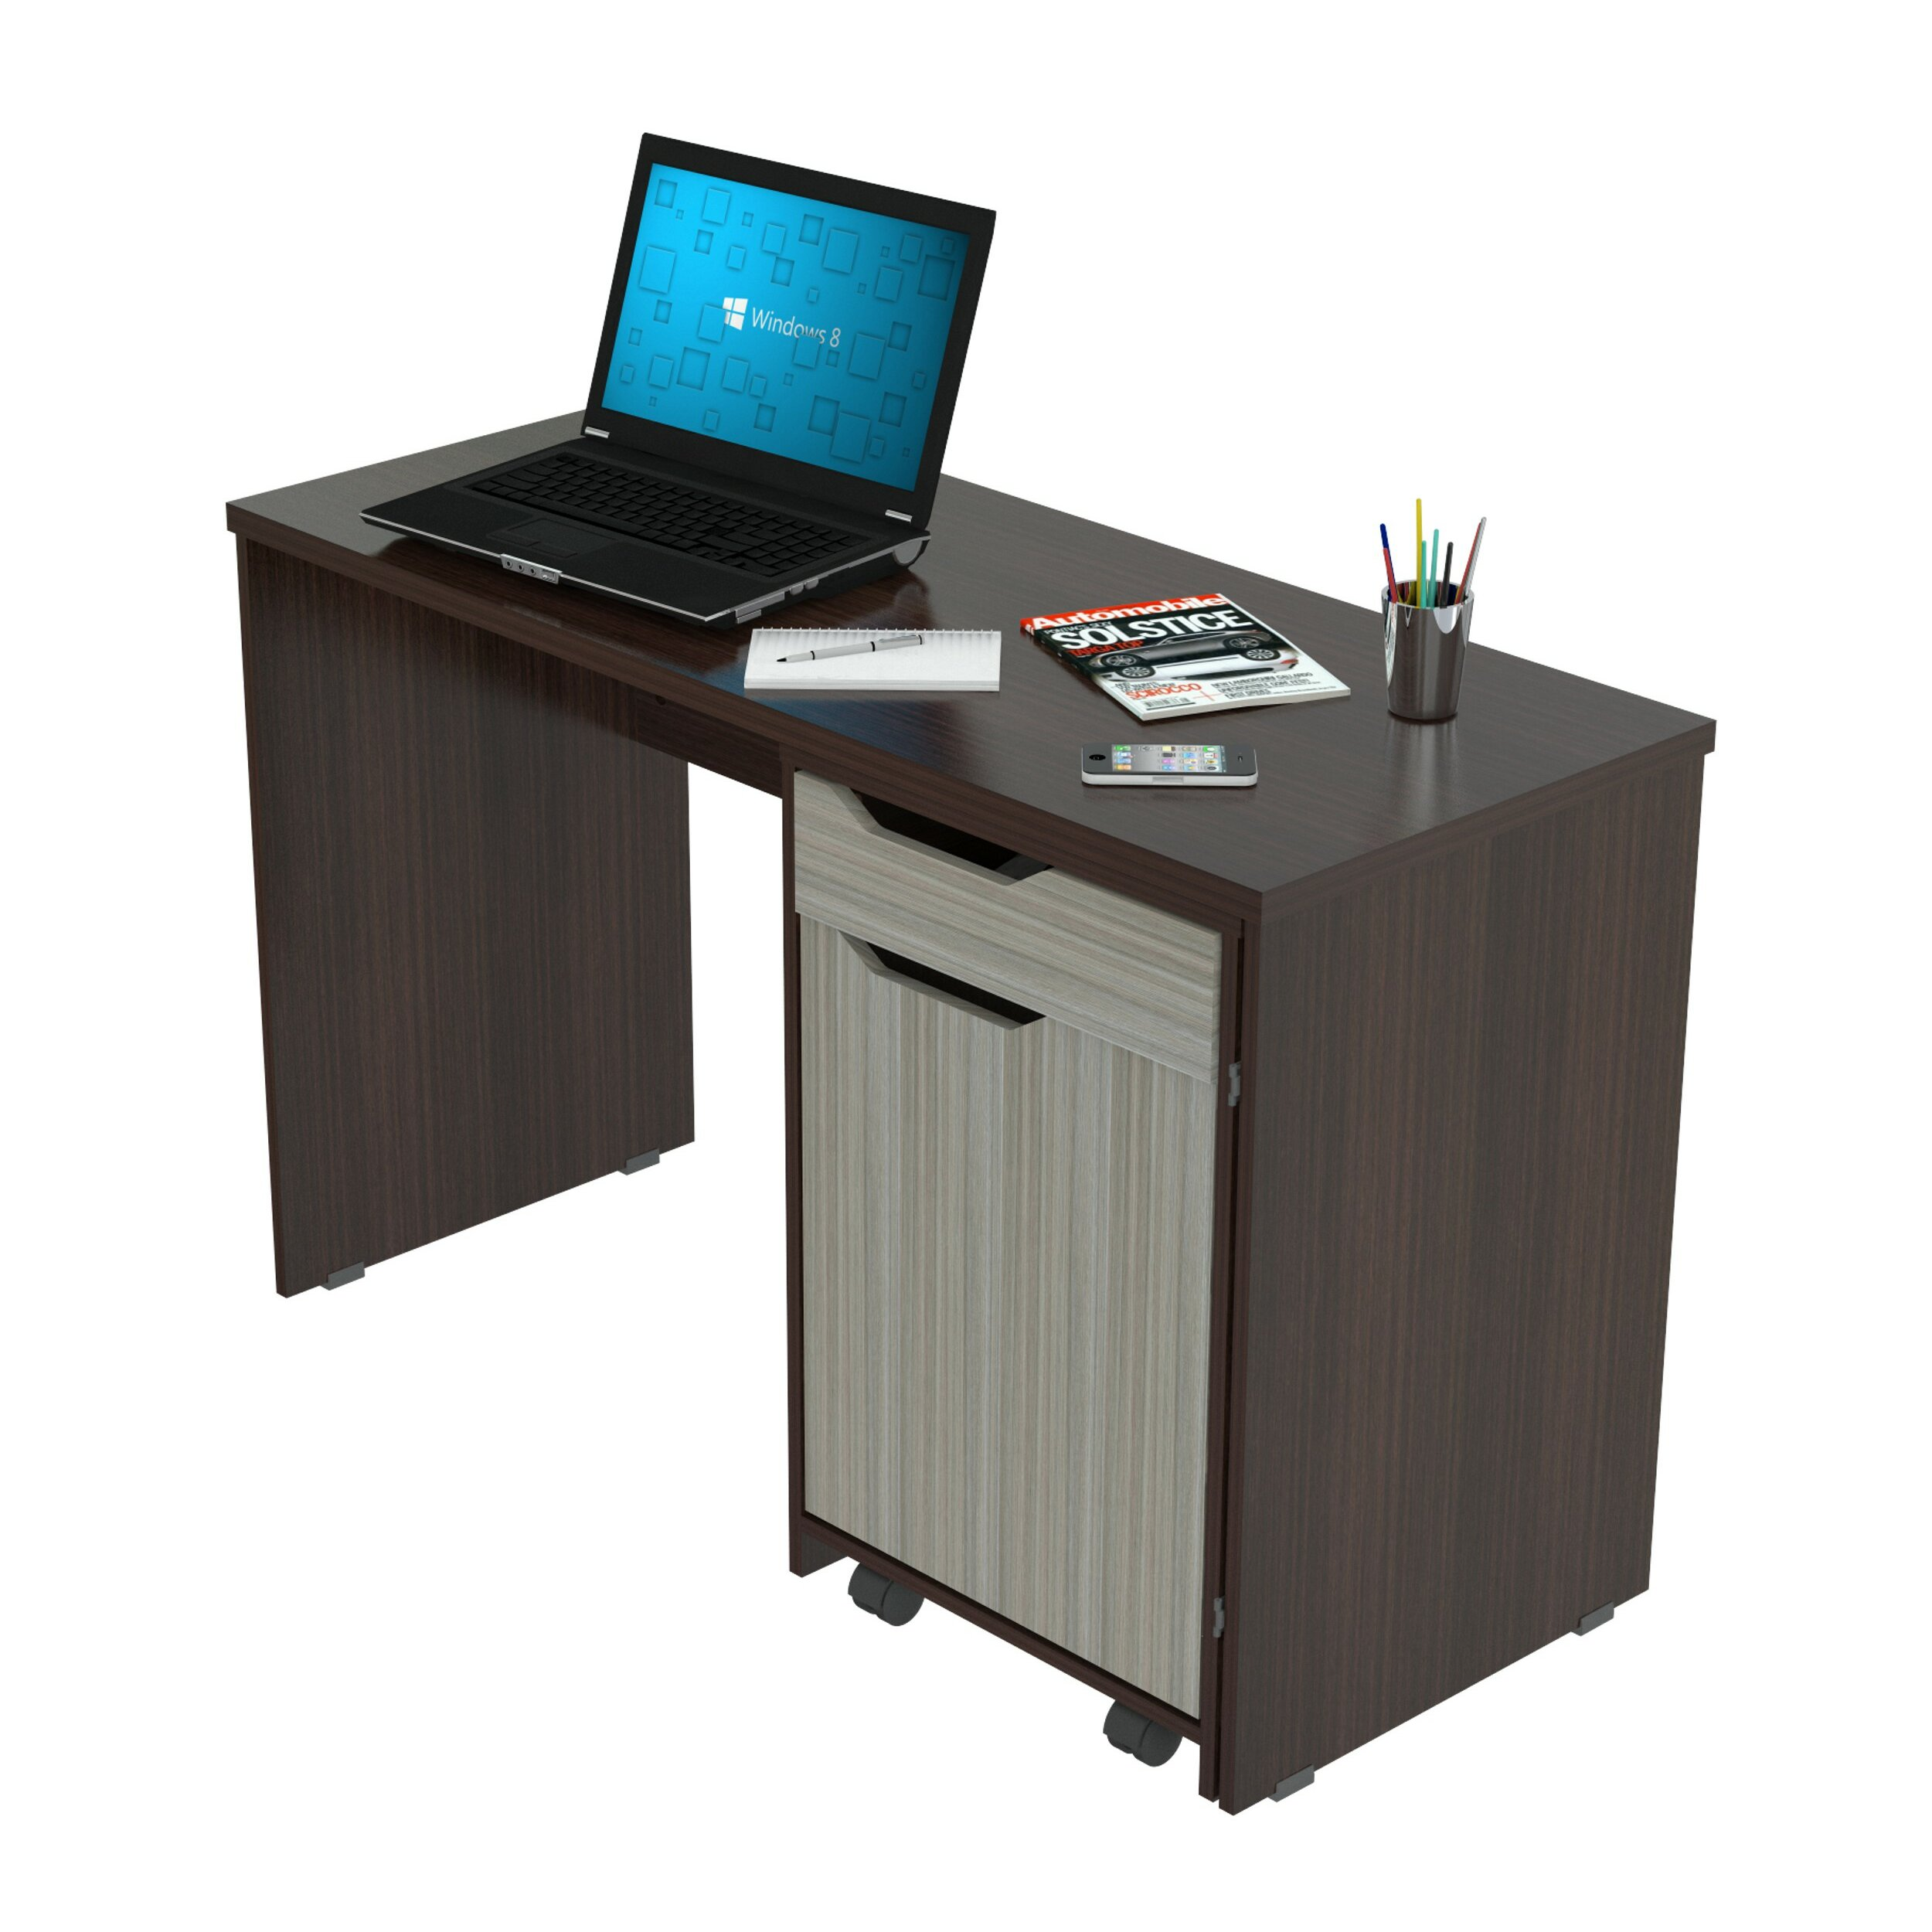 Inval Computer Desk Storage Desk & Reviews   Wayfair.ca